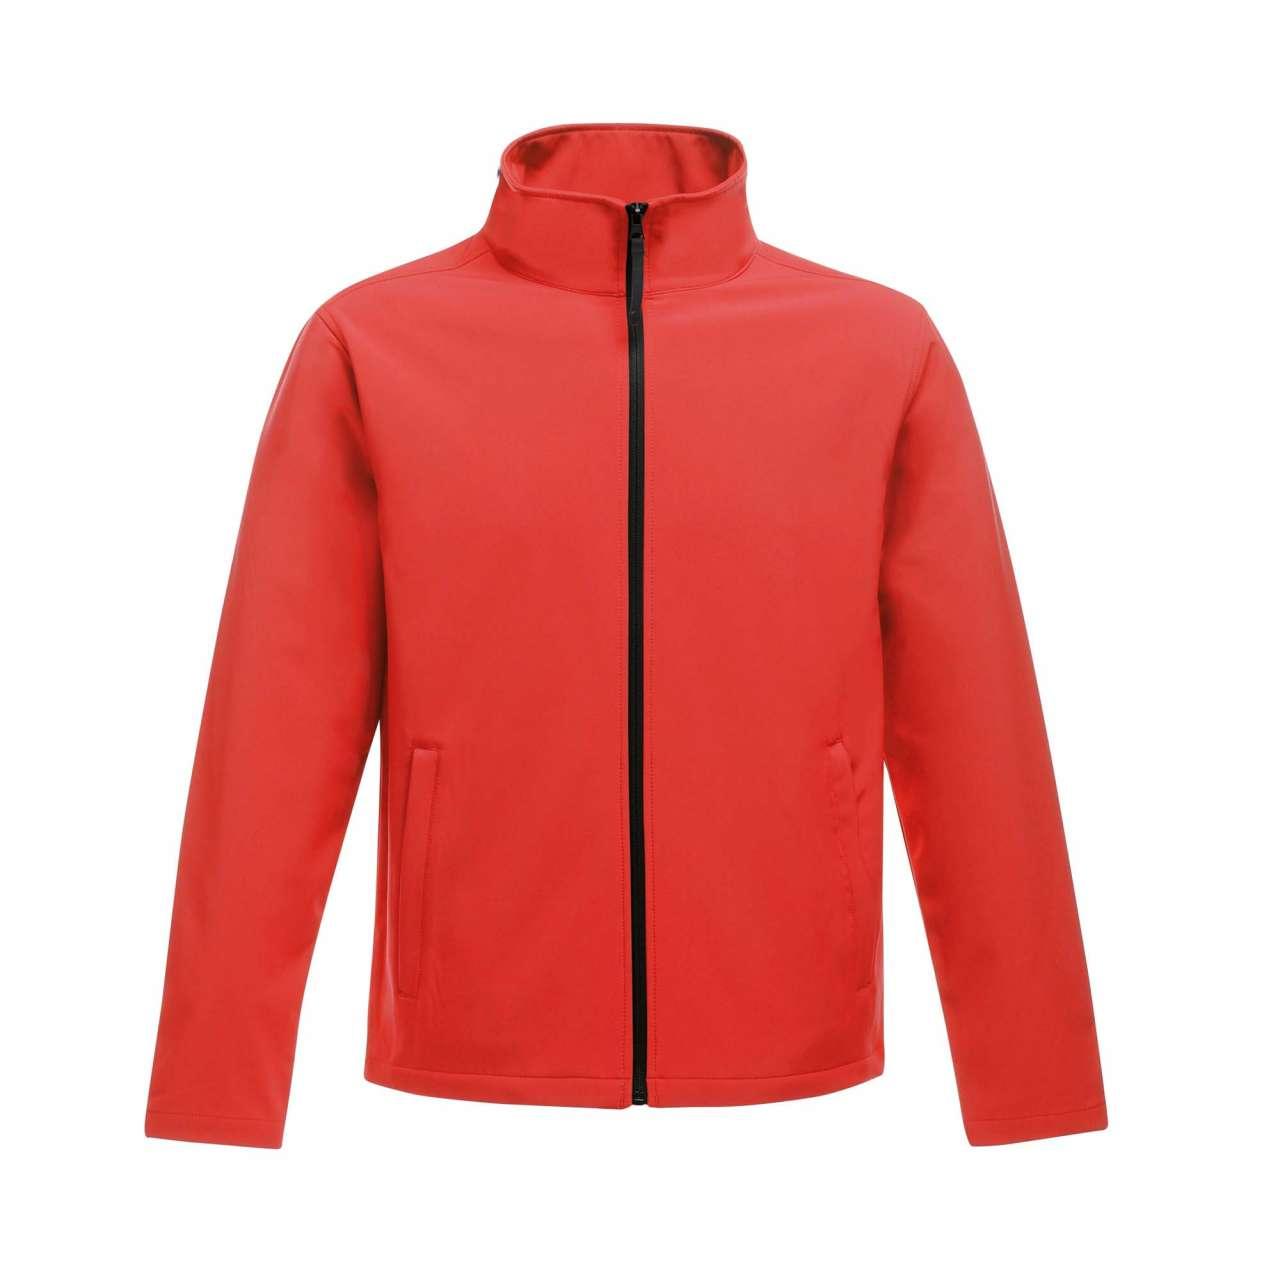 Softshell RETRA629 rosu negru Veste jachete dama barbatesti polar fleece softshell fas gluga ploaie vant broderie serigrafie termotransfer